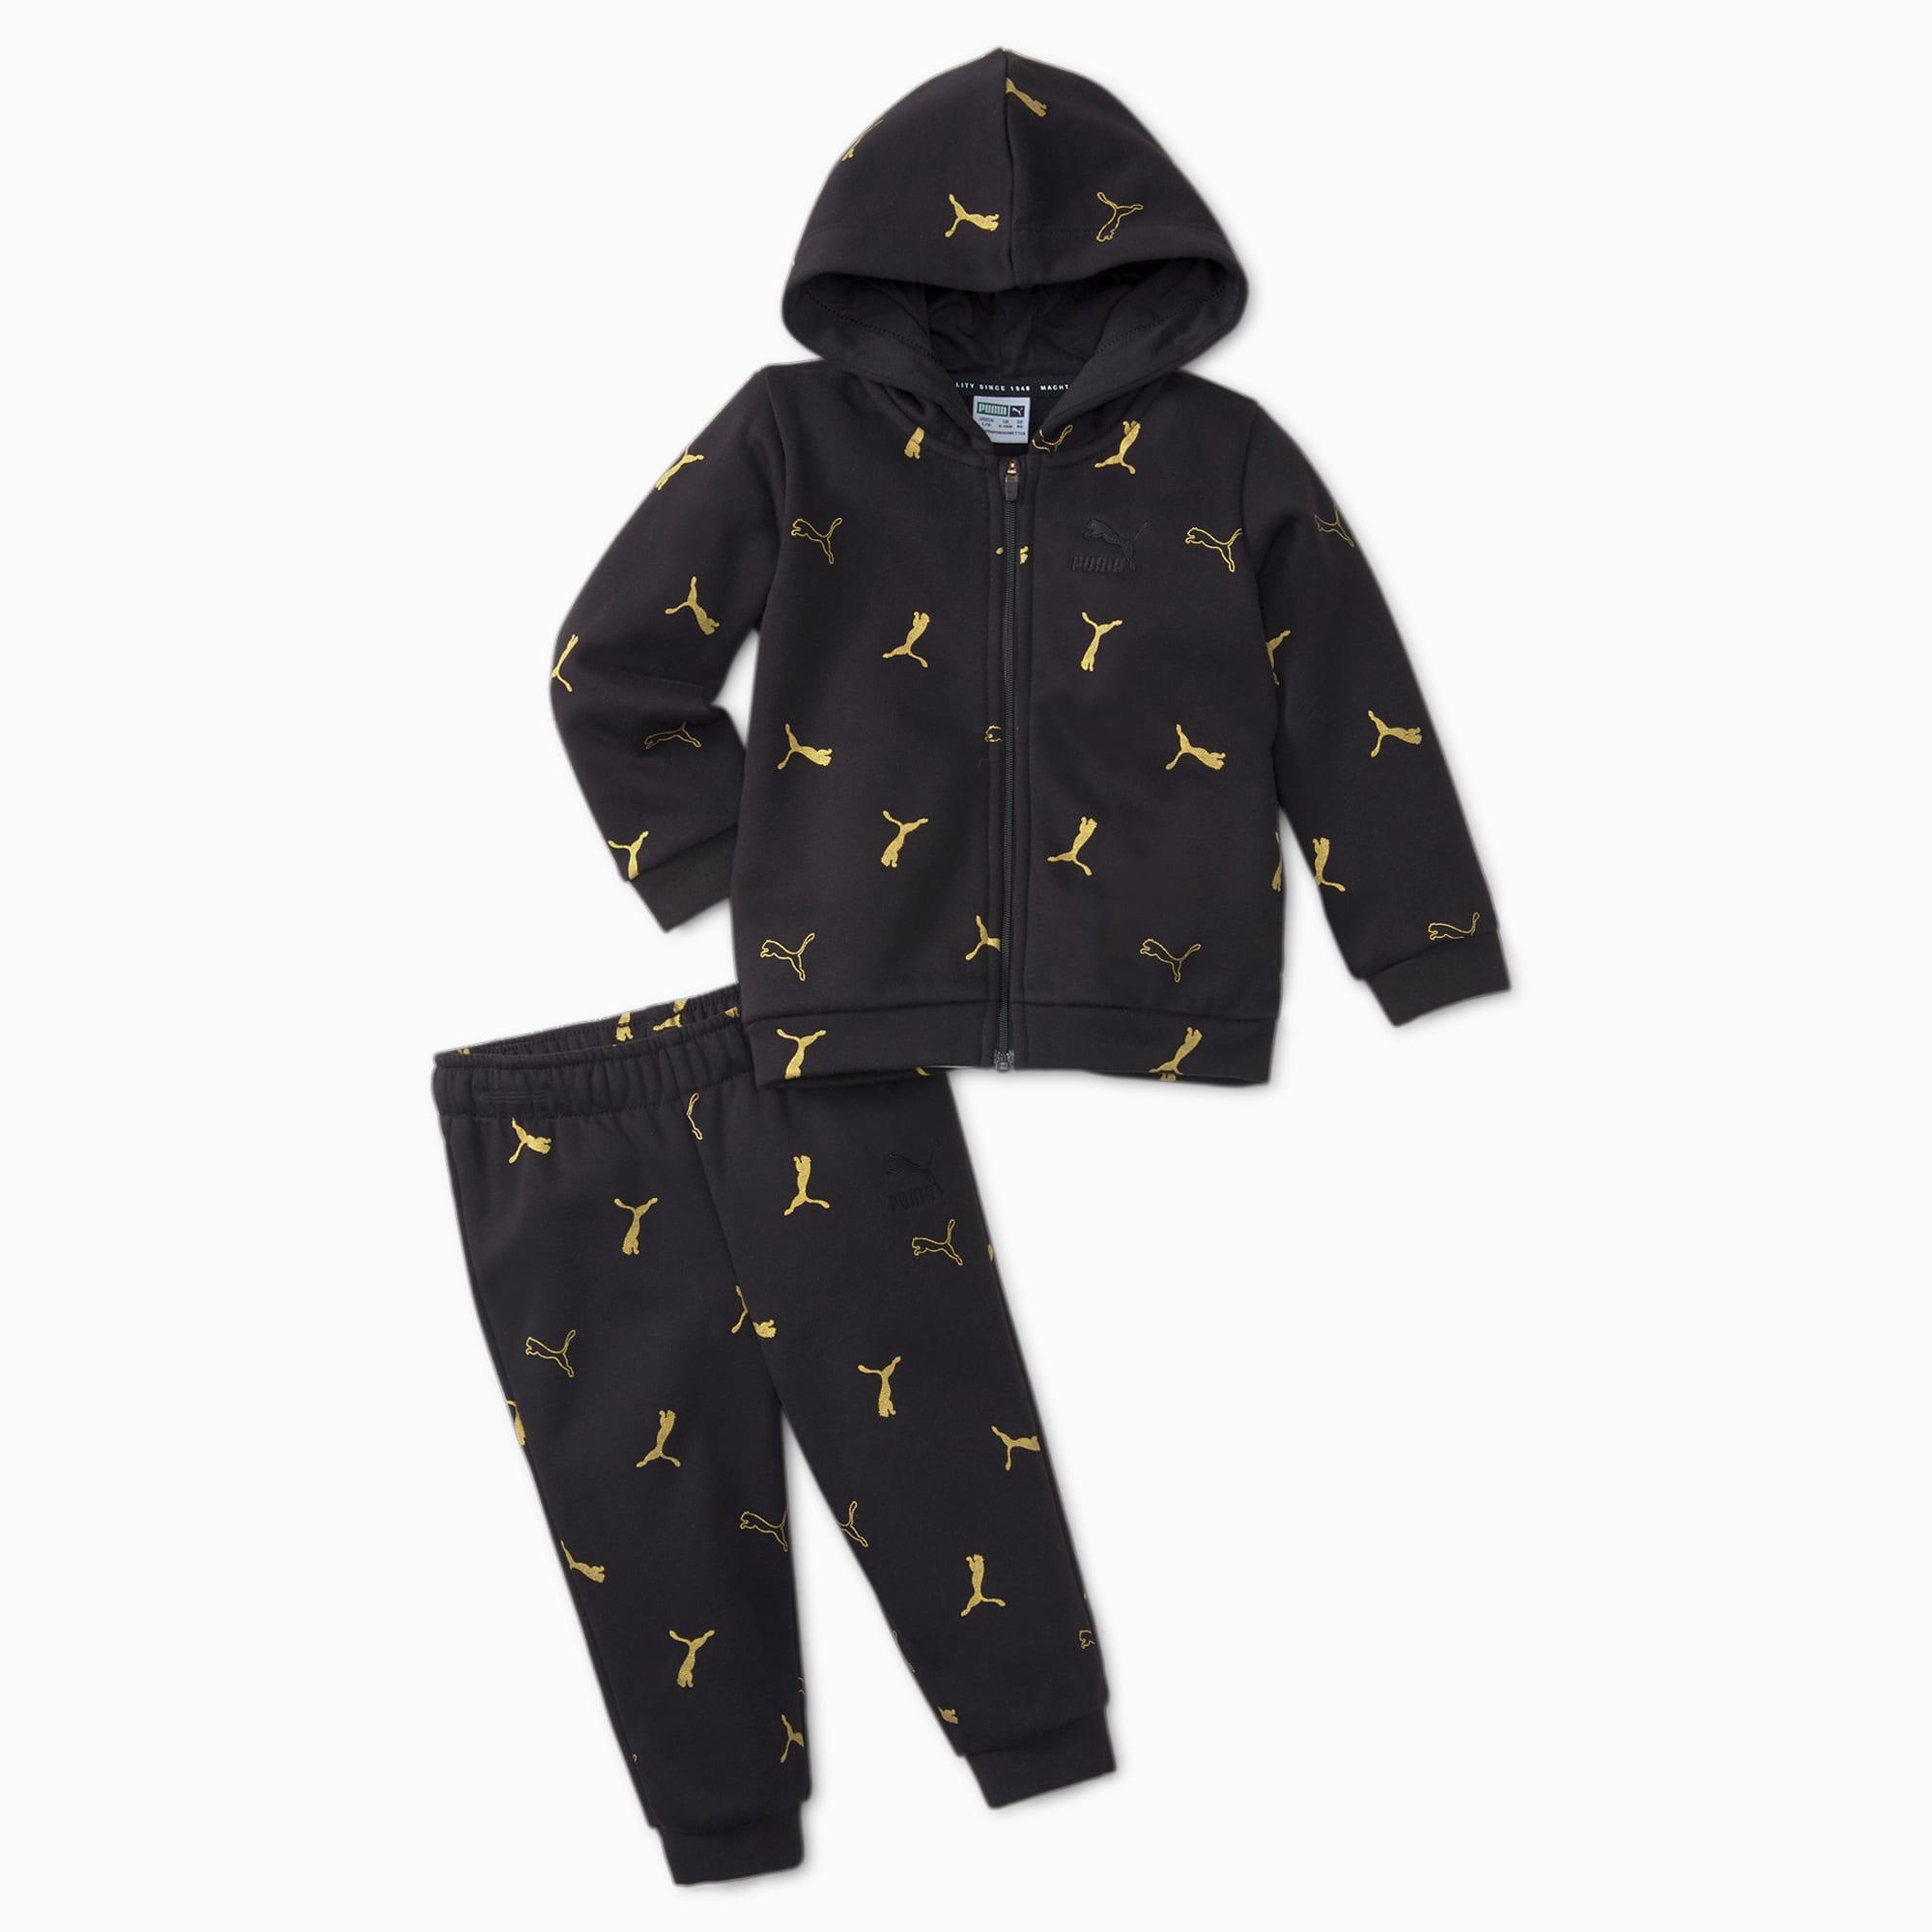 PUMA Minicats Brand Love Printed Babies' Jogger Set, Black, size 1-2 Youth, Clothing